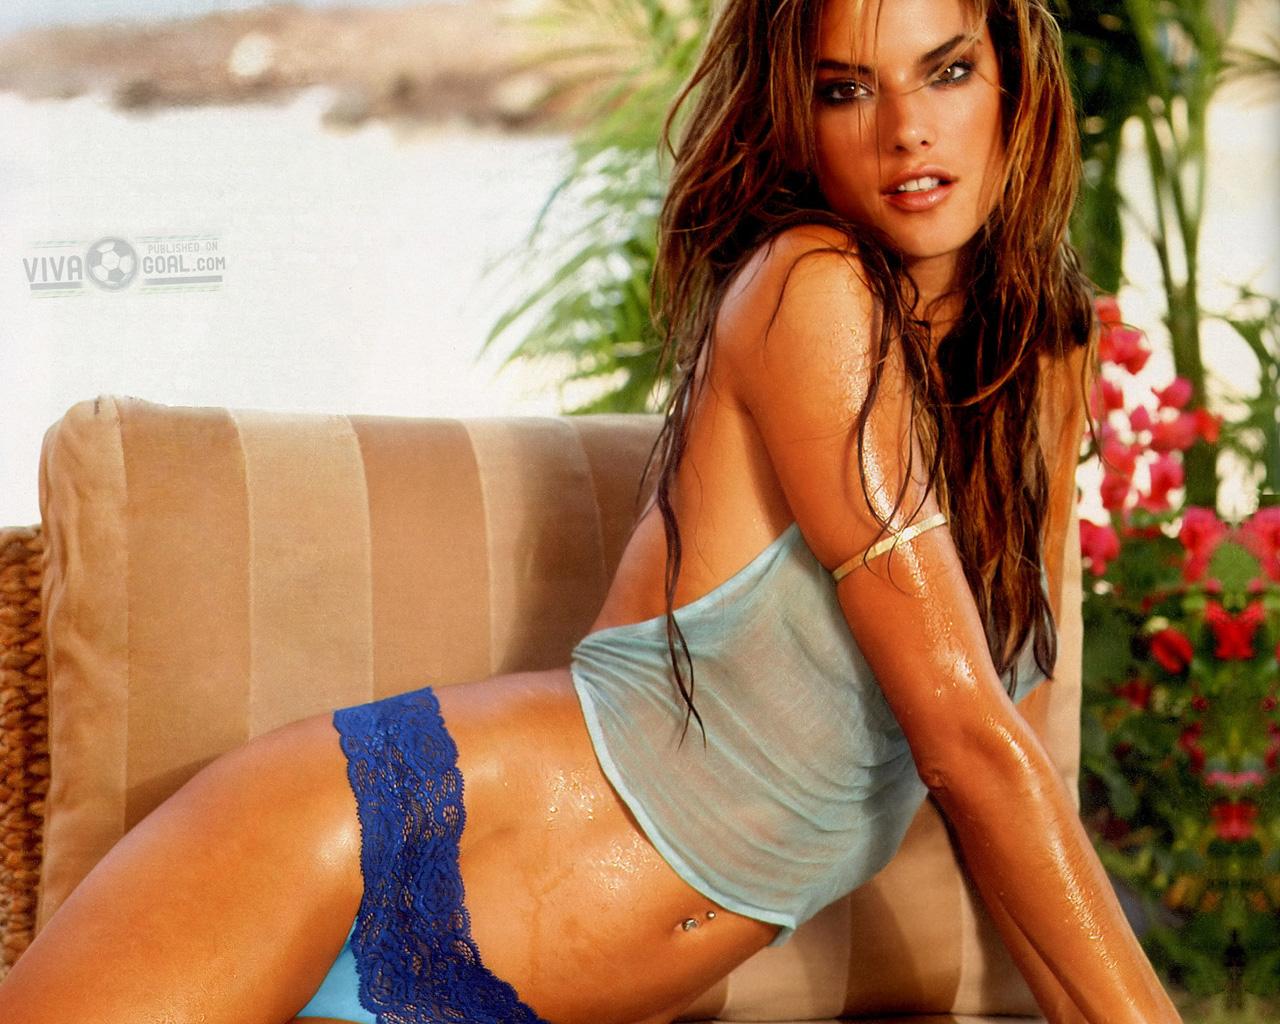 http://4.bp.blogspot.com/-7IepEcH4zwE/TlDsWuNP7uI/AAAAAAAAA7c/-ZS0UbW6lCc/s1600/Alessandra-Ambrosio-08.jpg